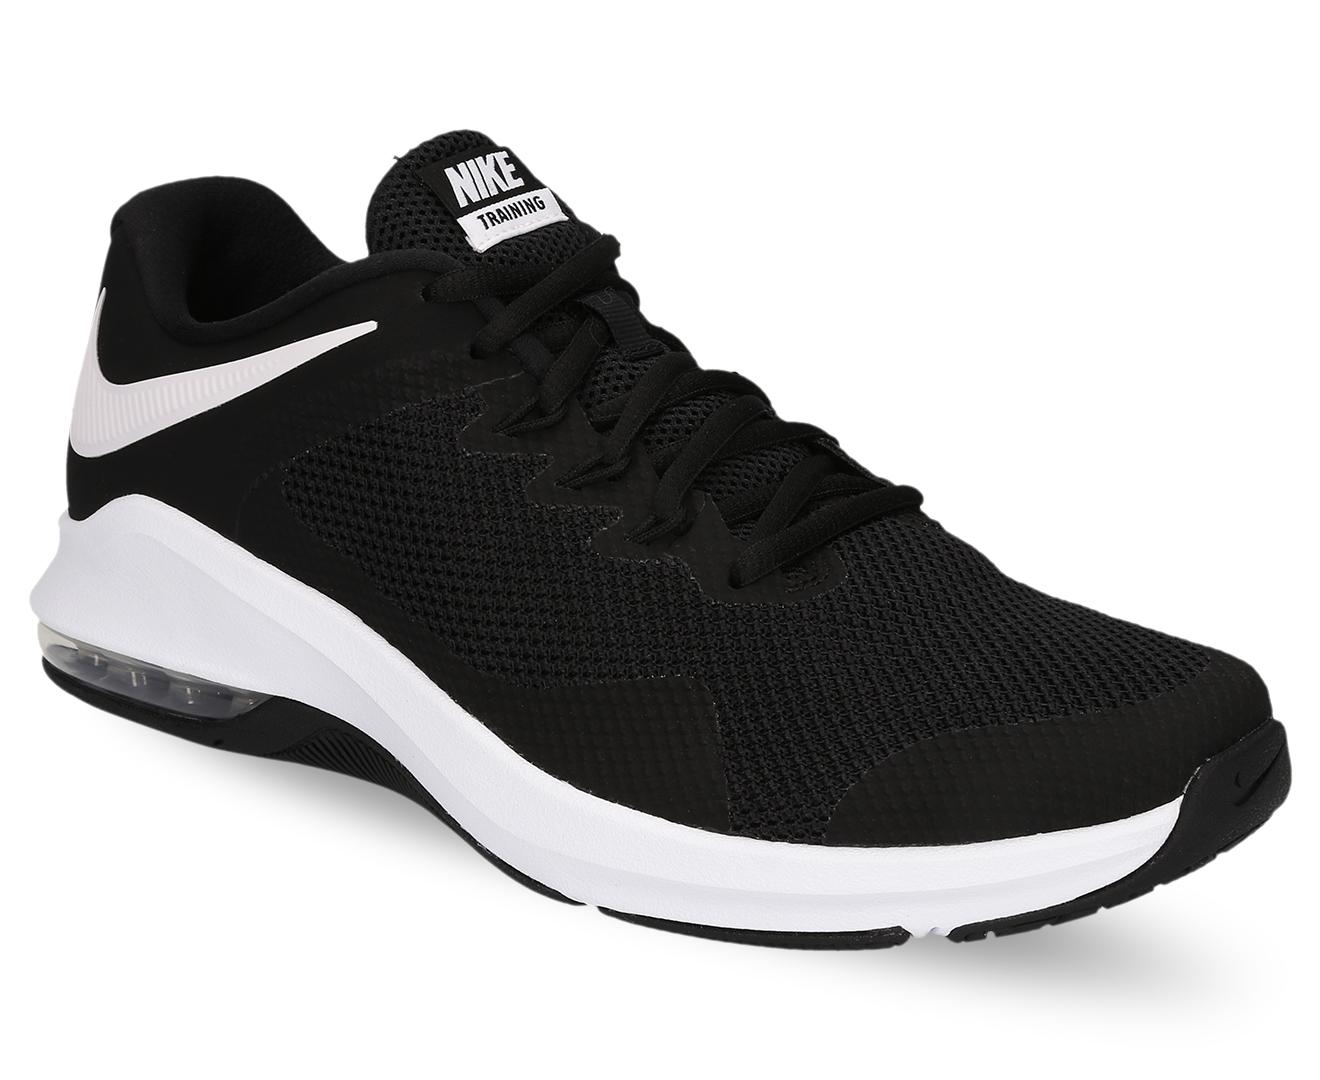 a20cd949751 Nike Men s Air Max Alpha Trainer Shoe - Black White